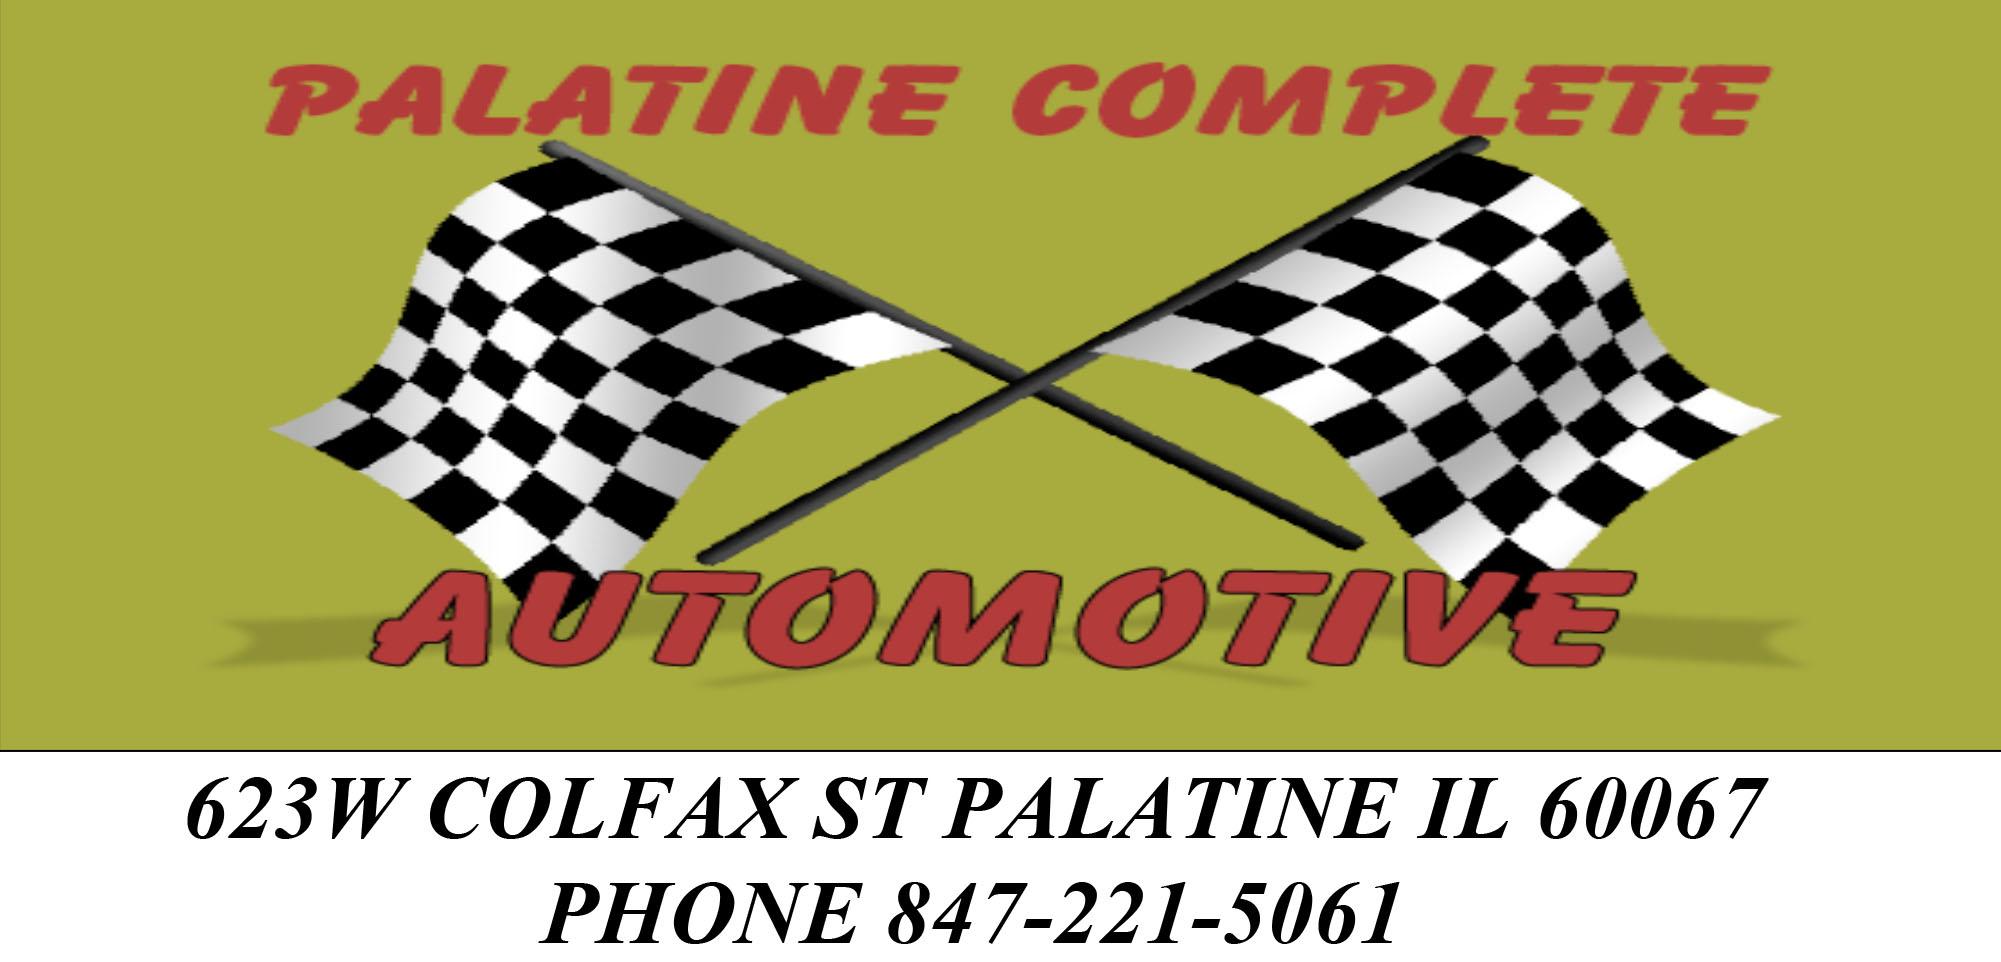 Palatine Complete Automotive